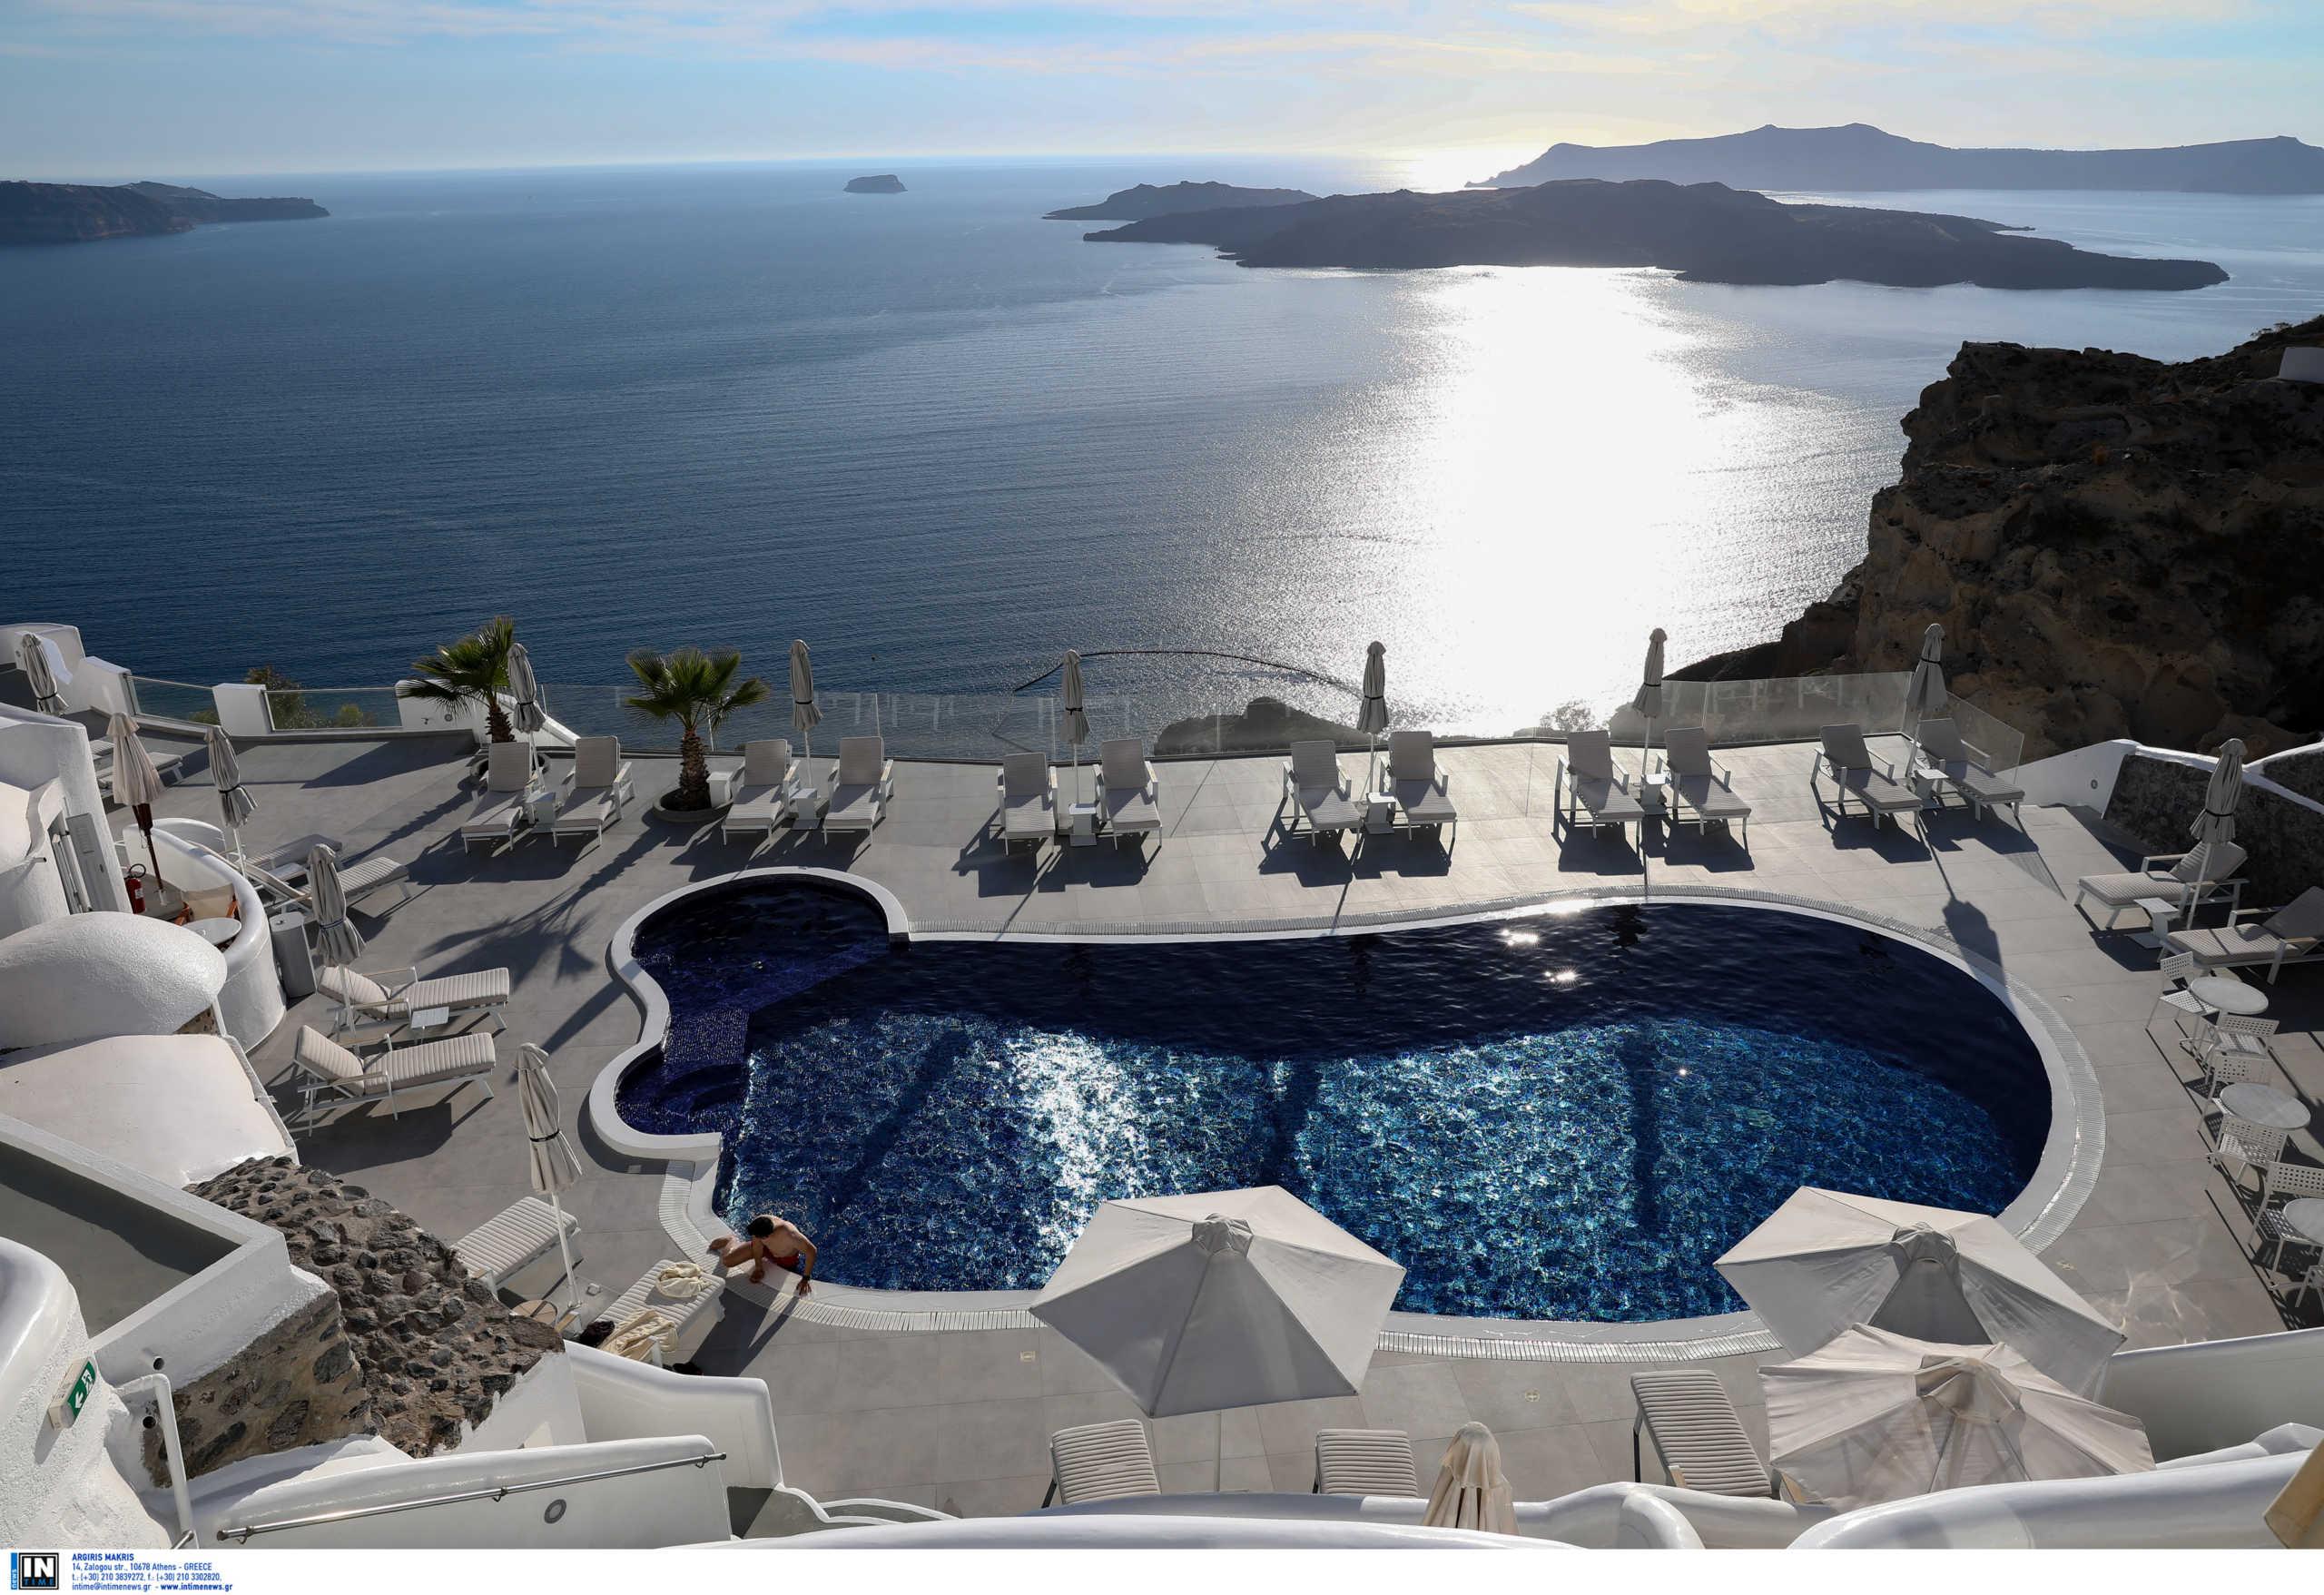 TUI: Η Ελλάδα ο πιο δημοφιλής προορισμός – Προσφέρει ταξίδια διακοπών έως και τον Νοέμβριο